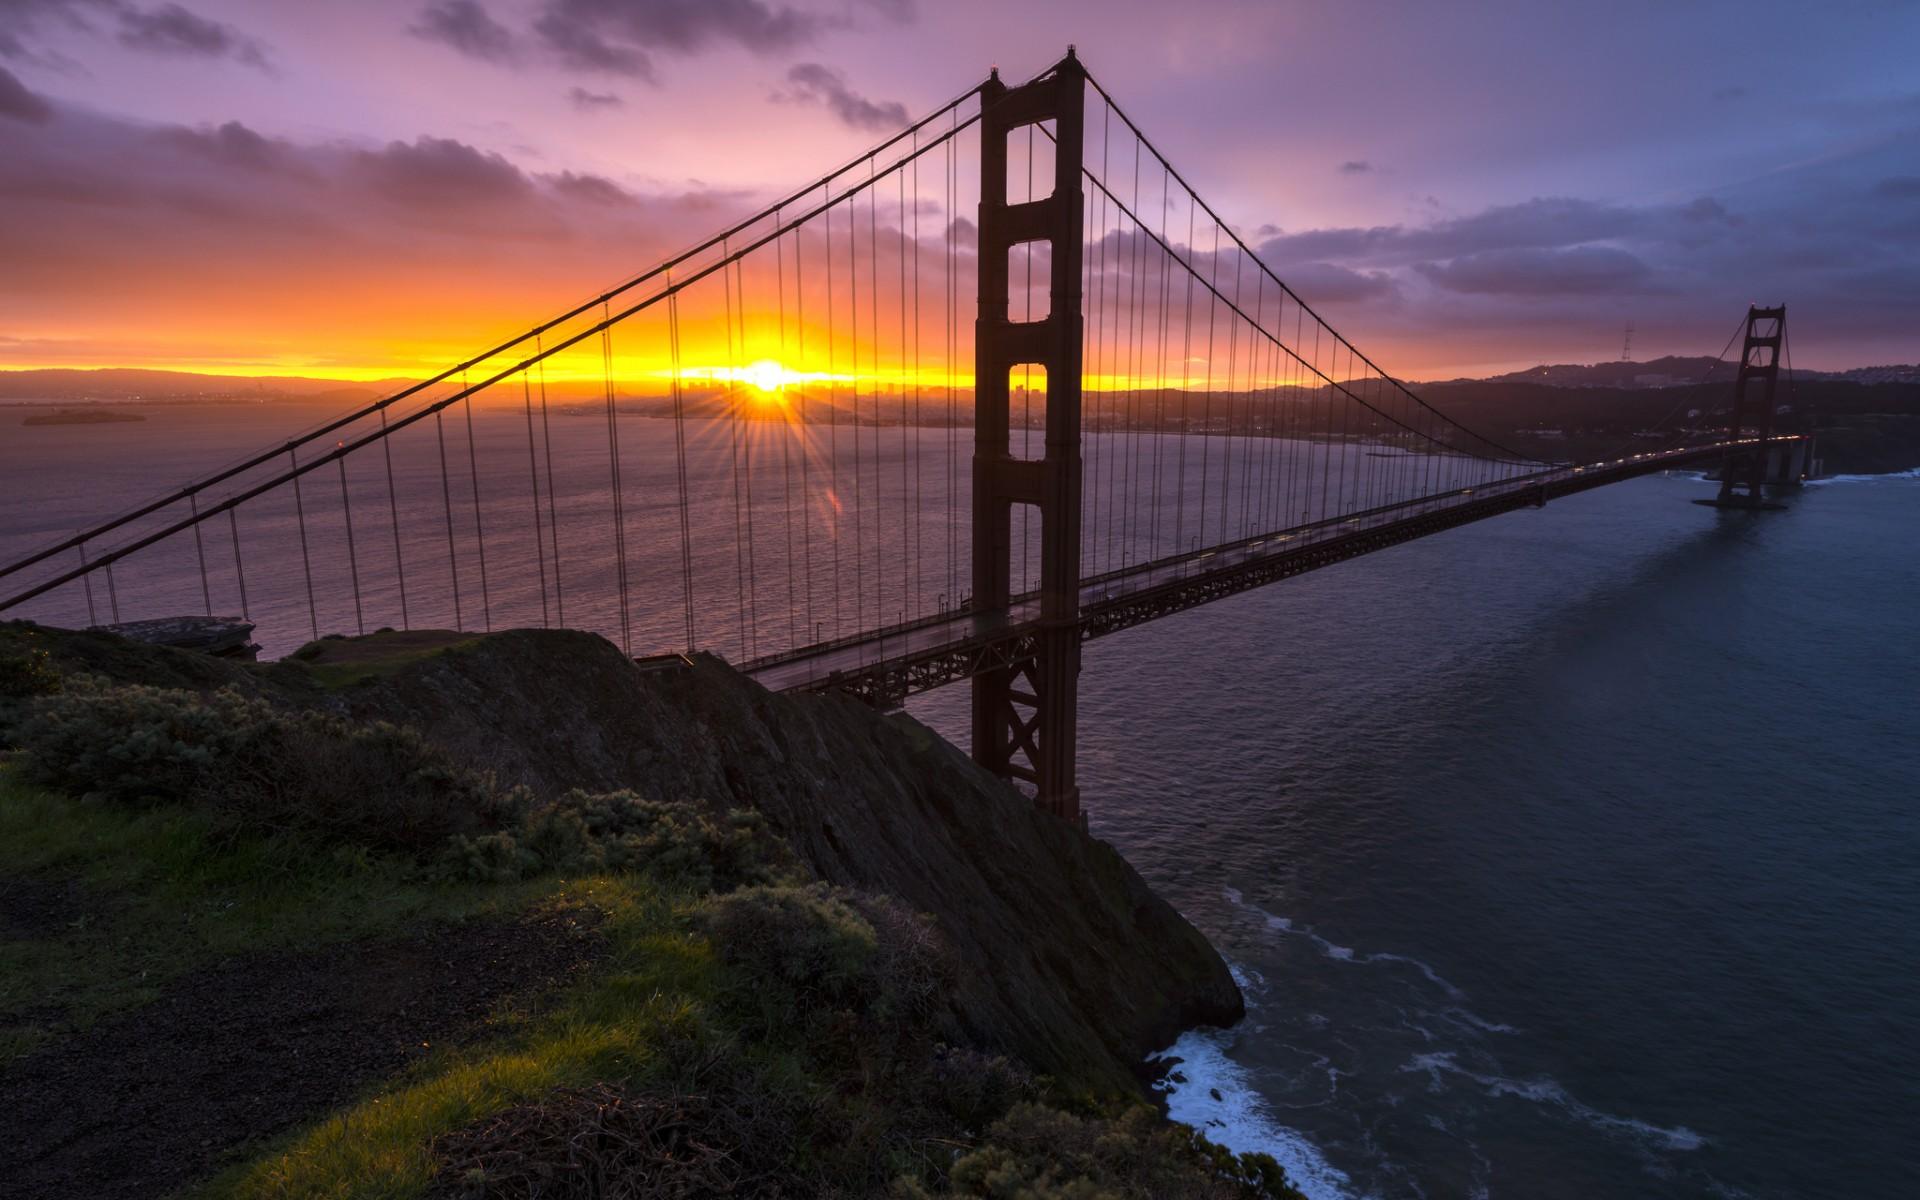 Golden Gate Bridge San Francisco Bay Ocean Sea Roads Sunset Sky Wallpaper 1920x1200 84801 Wallpaperup